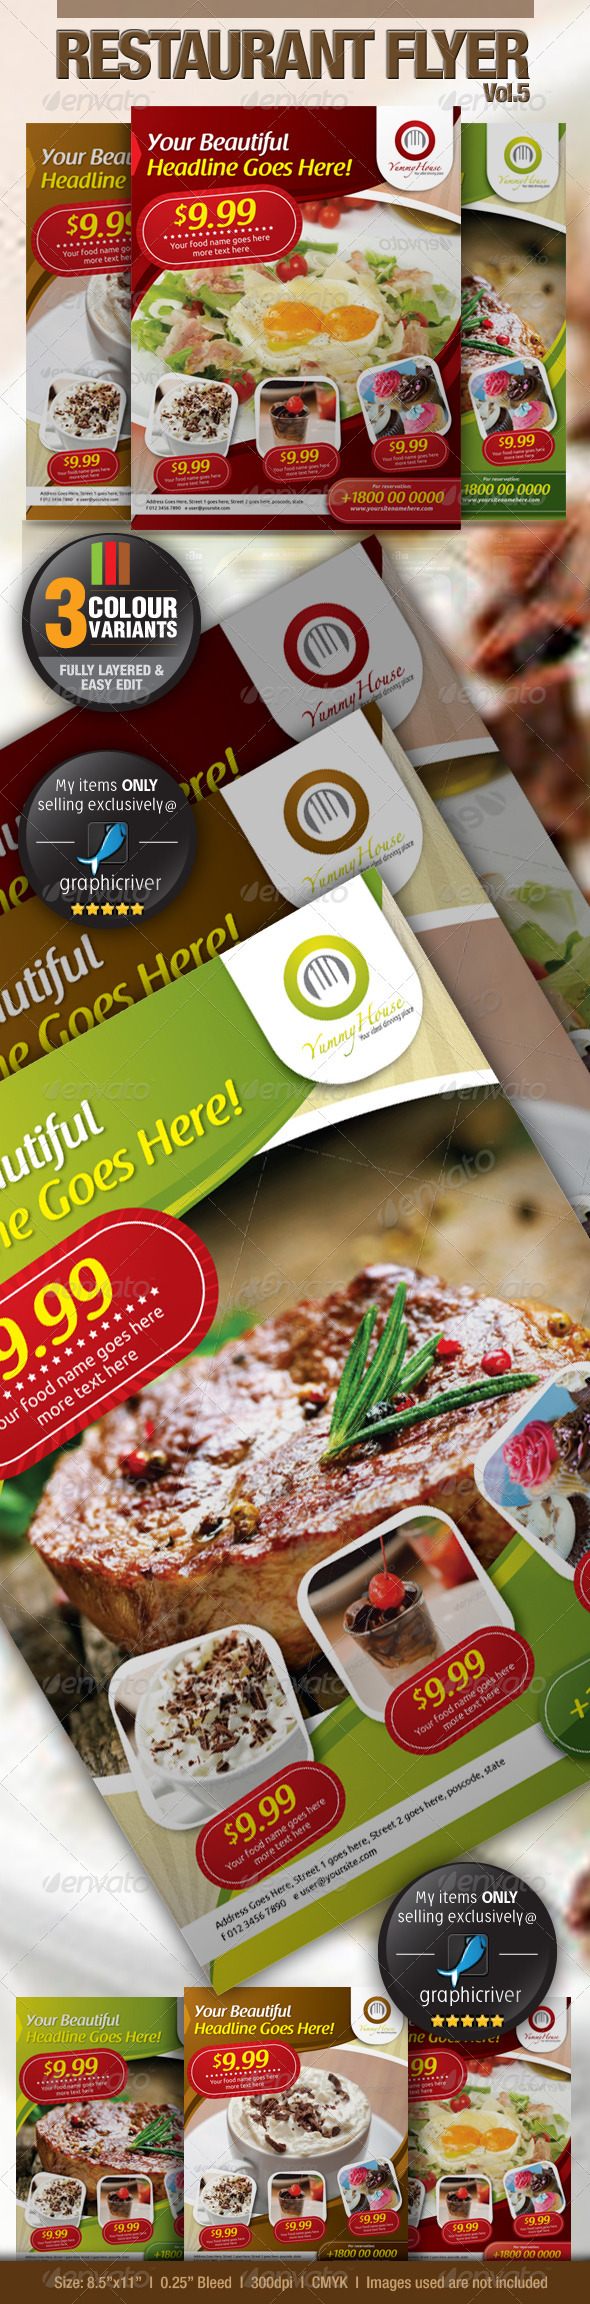 GraphicRiver Restaurant Flyer Vol.5 2826296